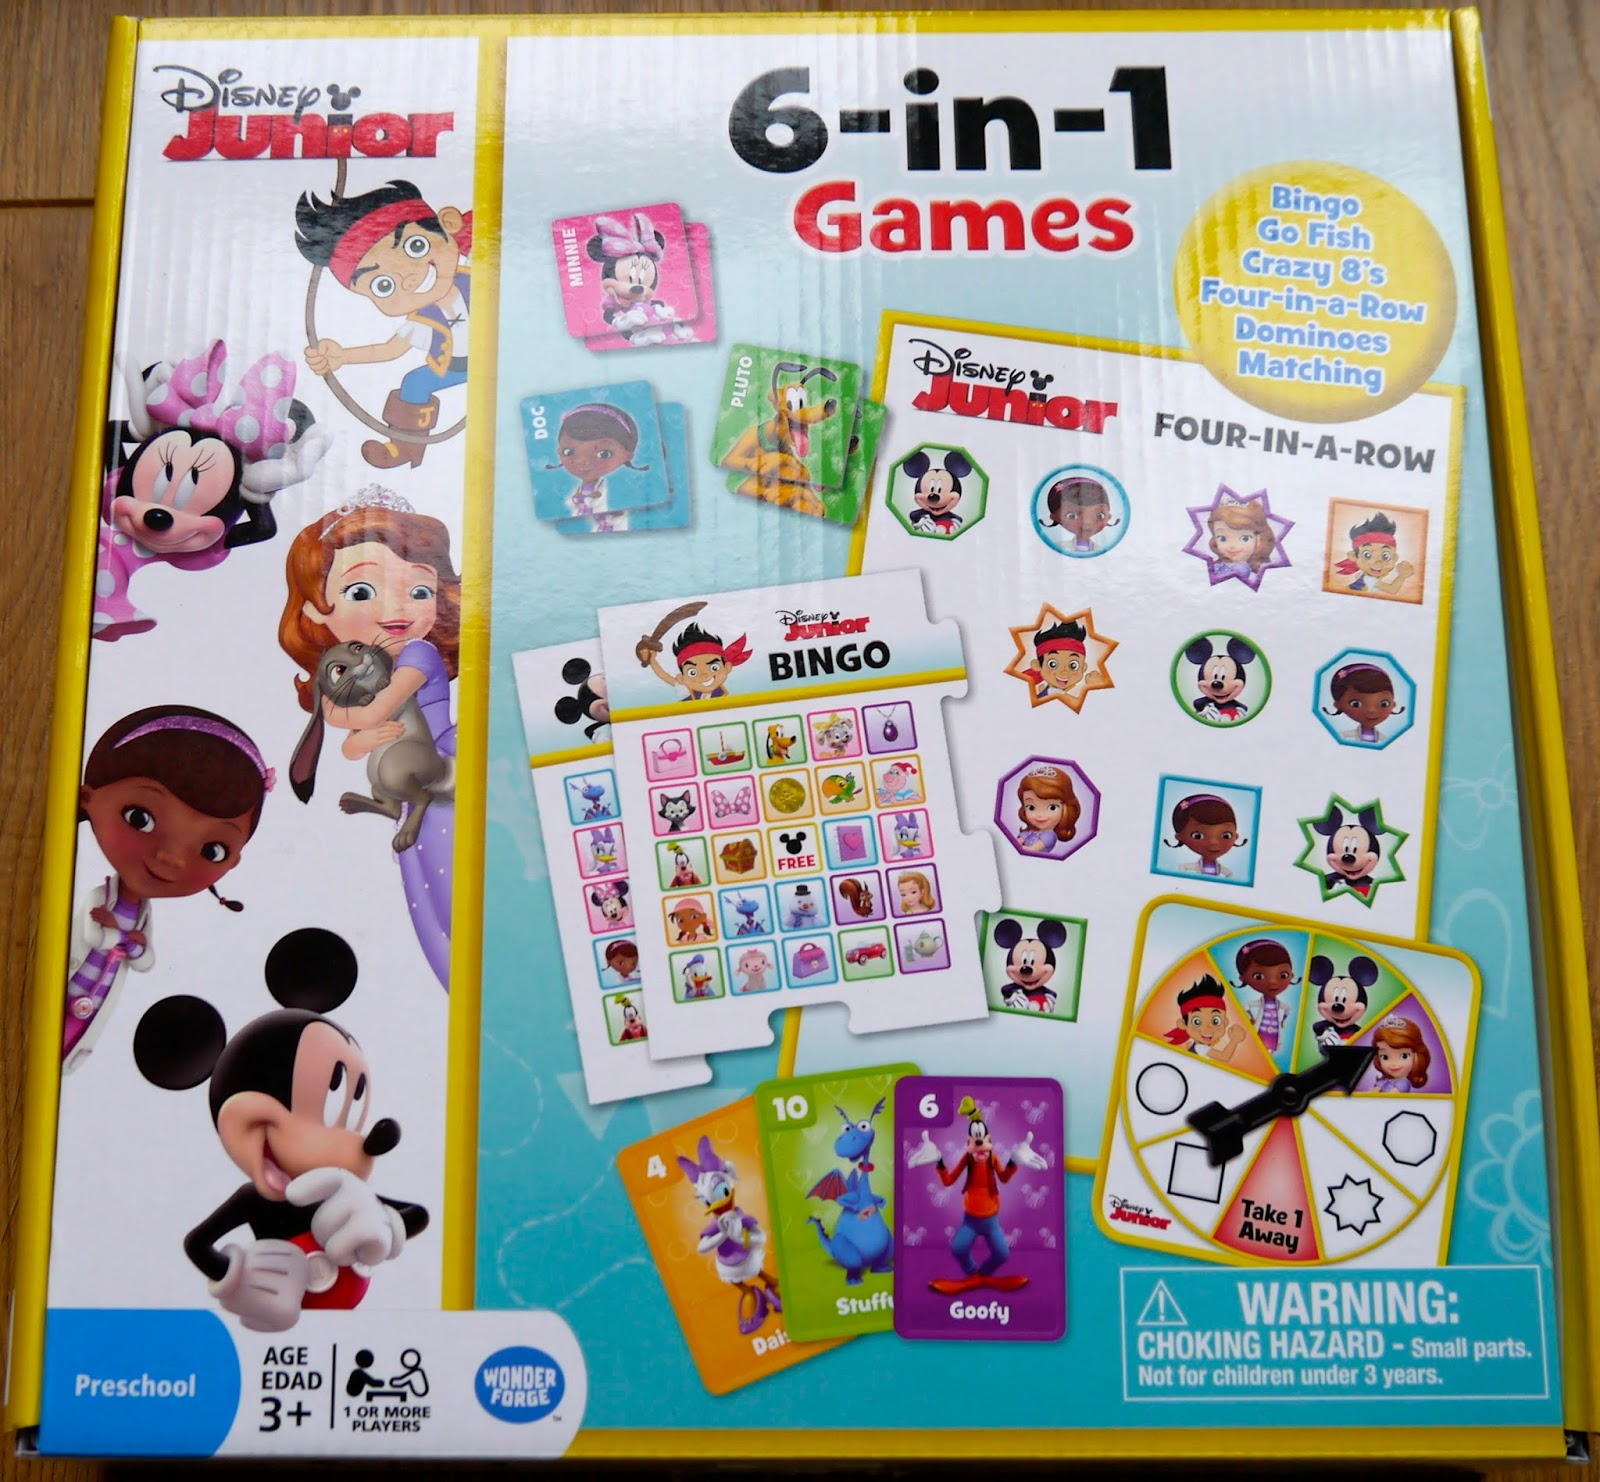 disney preschool games free disney junior 6 in 1 collection kerry louise norris 530